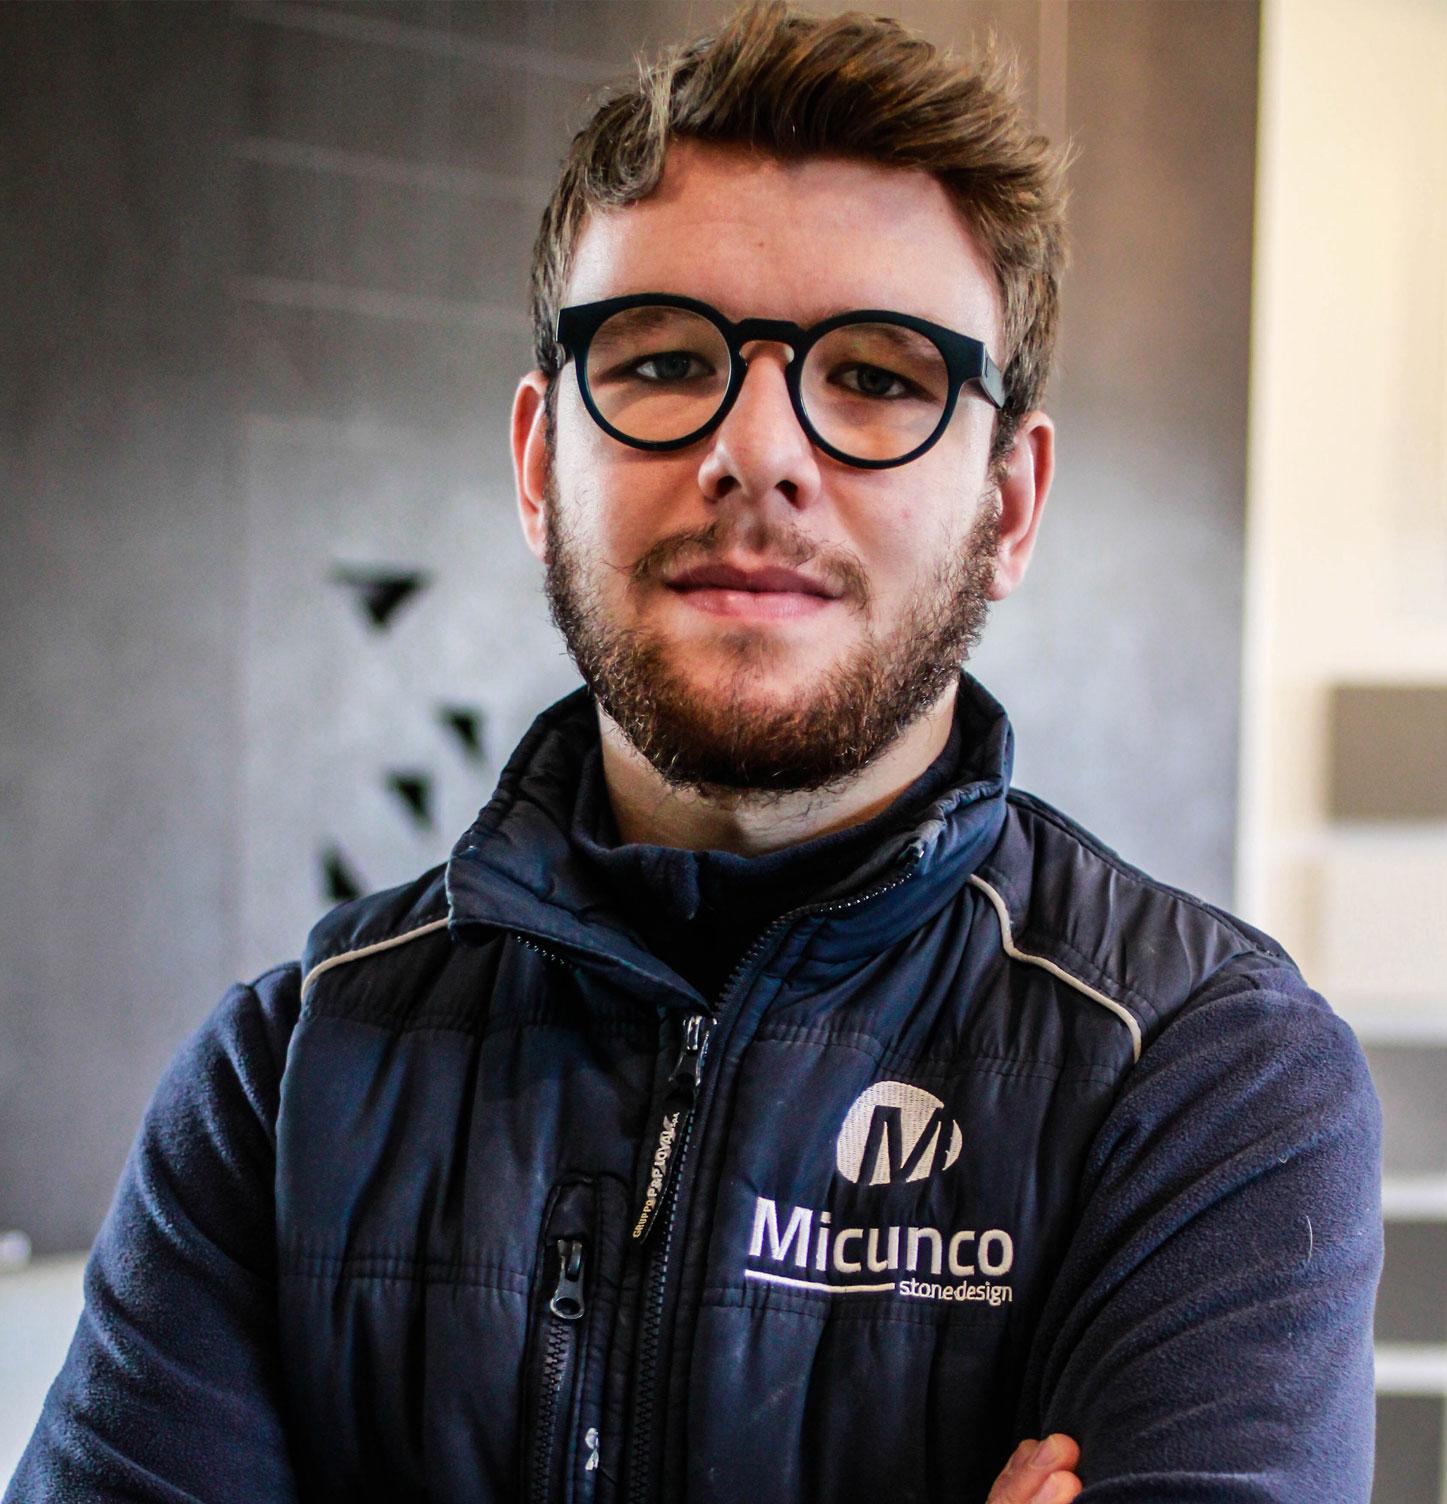 Paolo Micunco